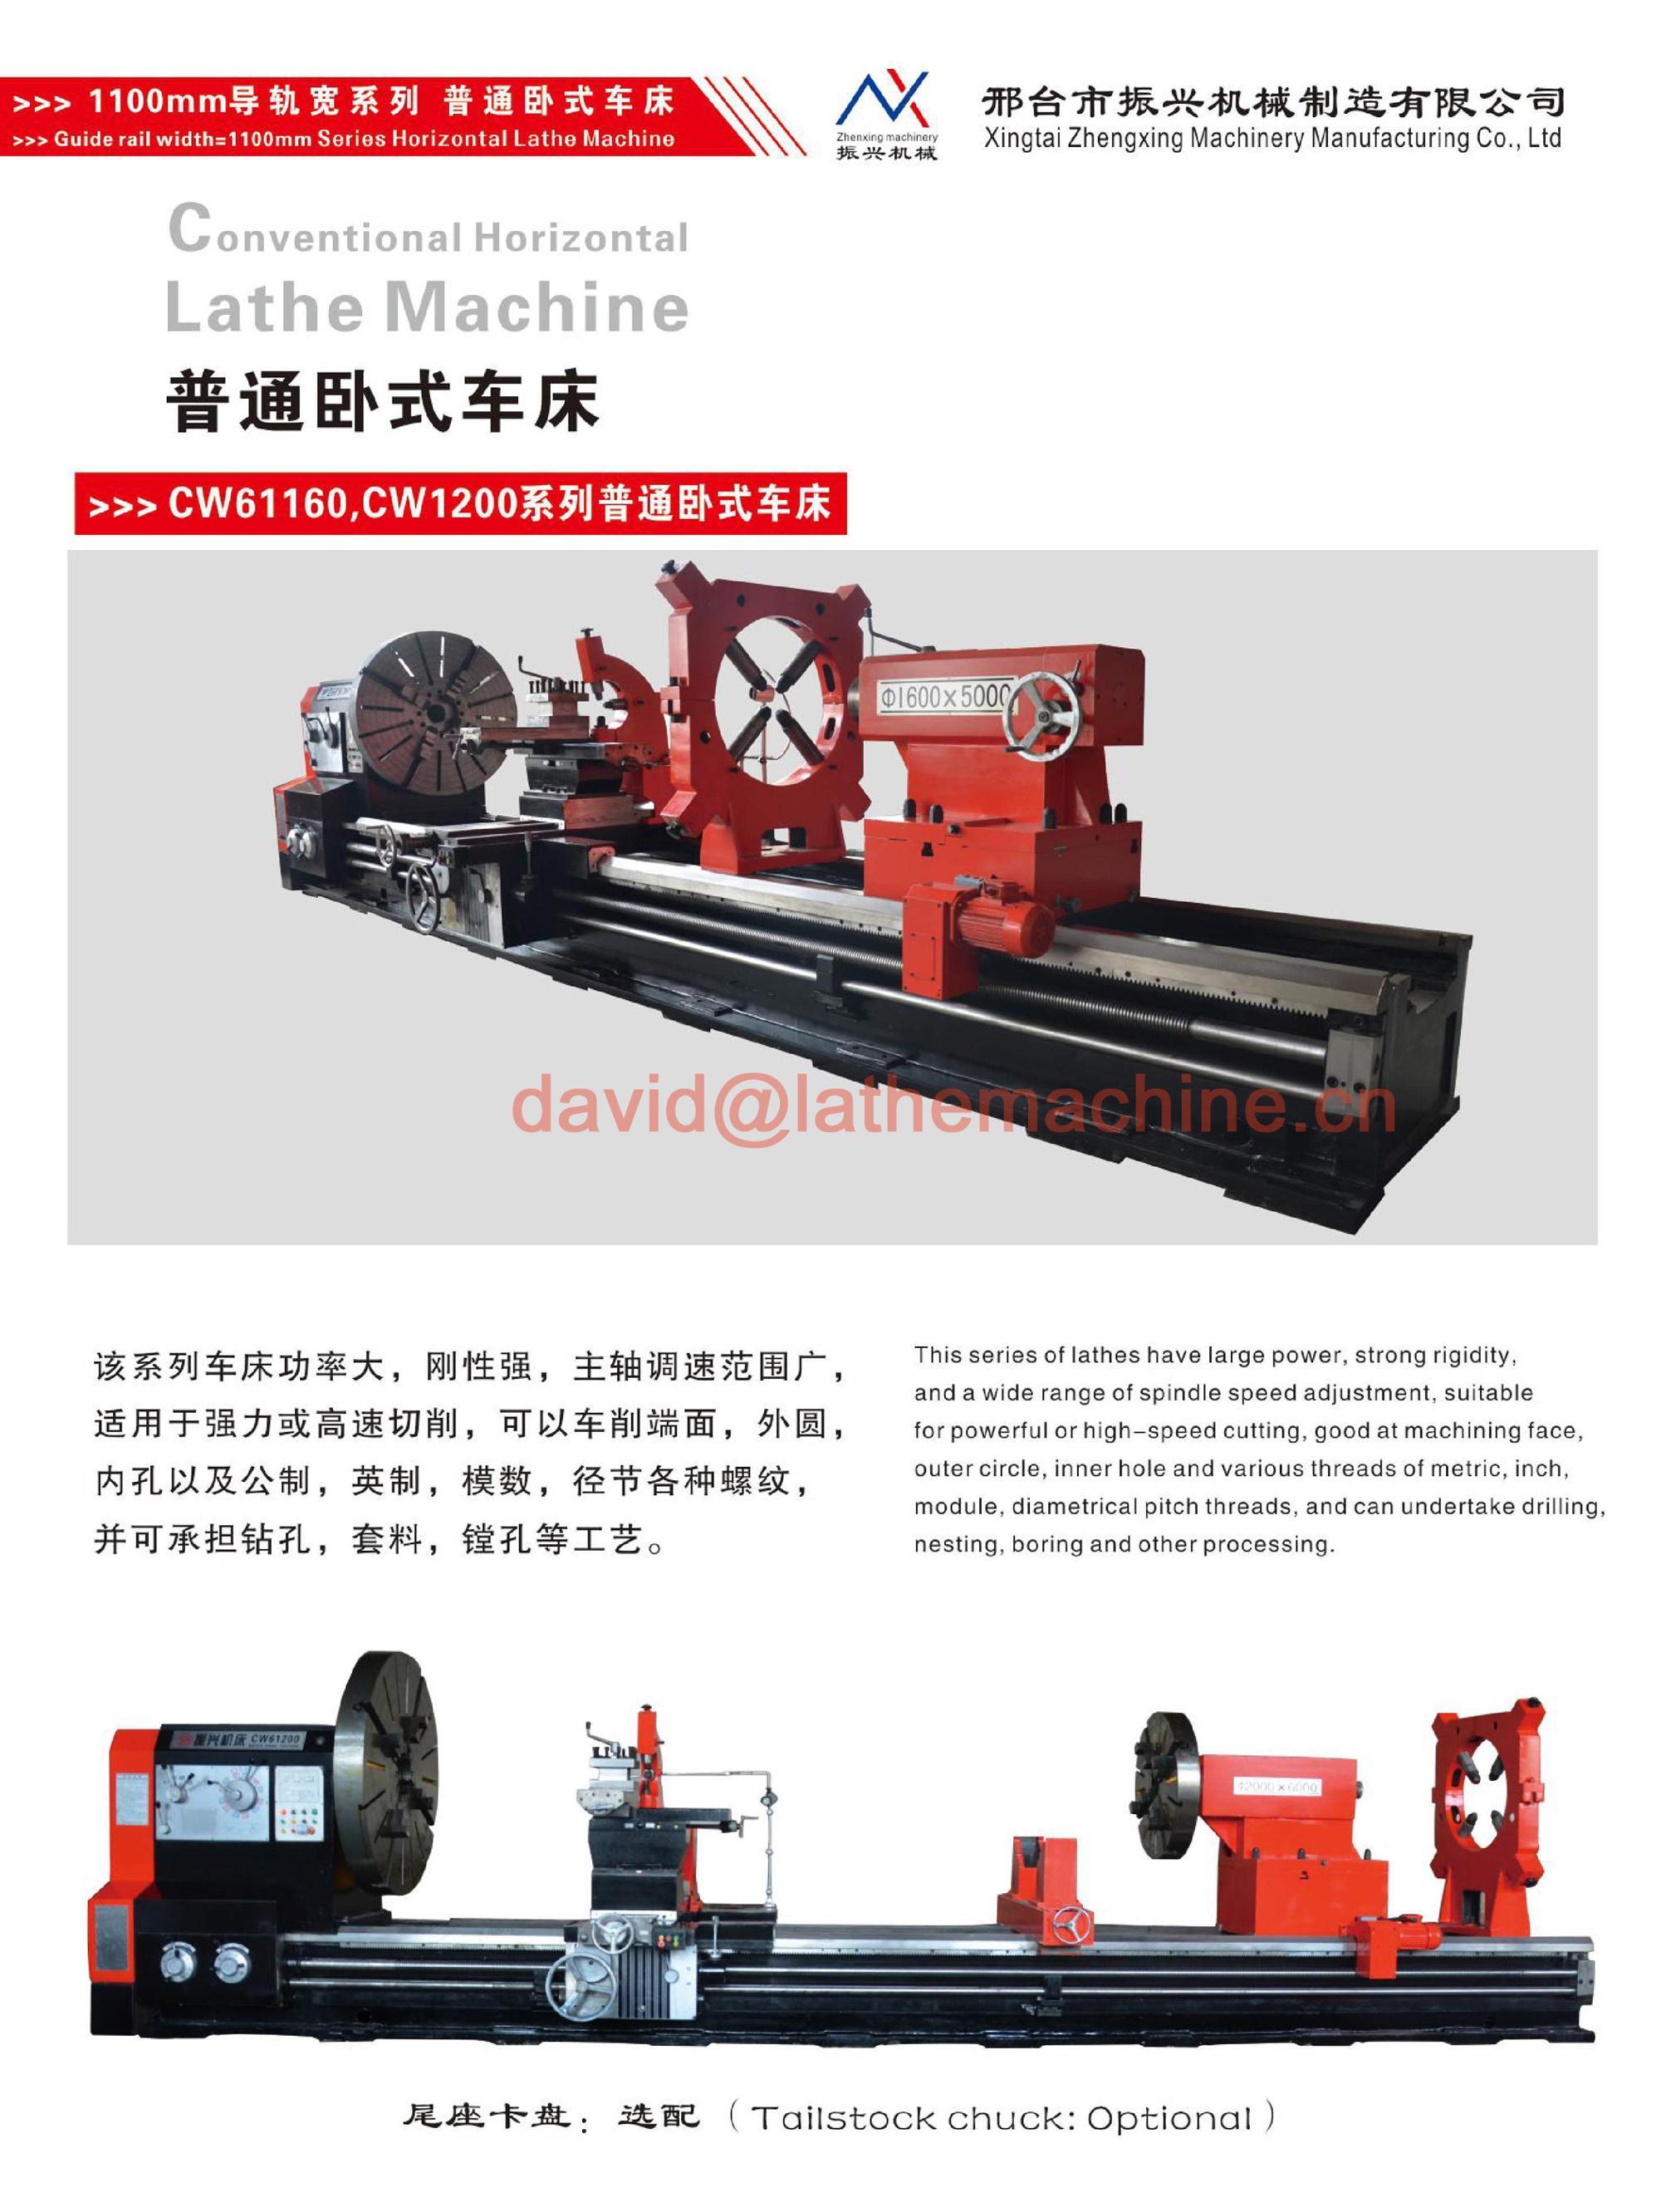 China Turner Face Plate Lathe Machine Price Buy Turner